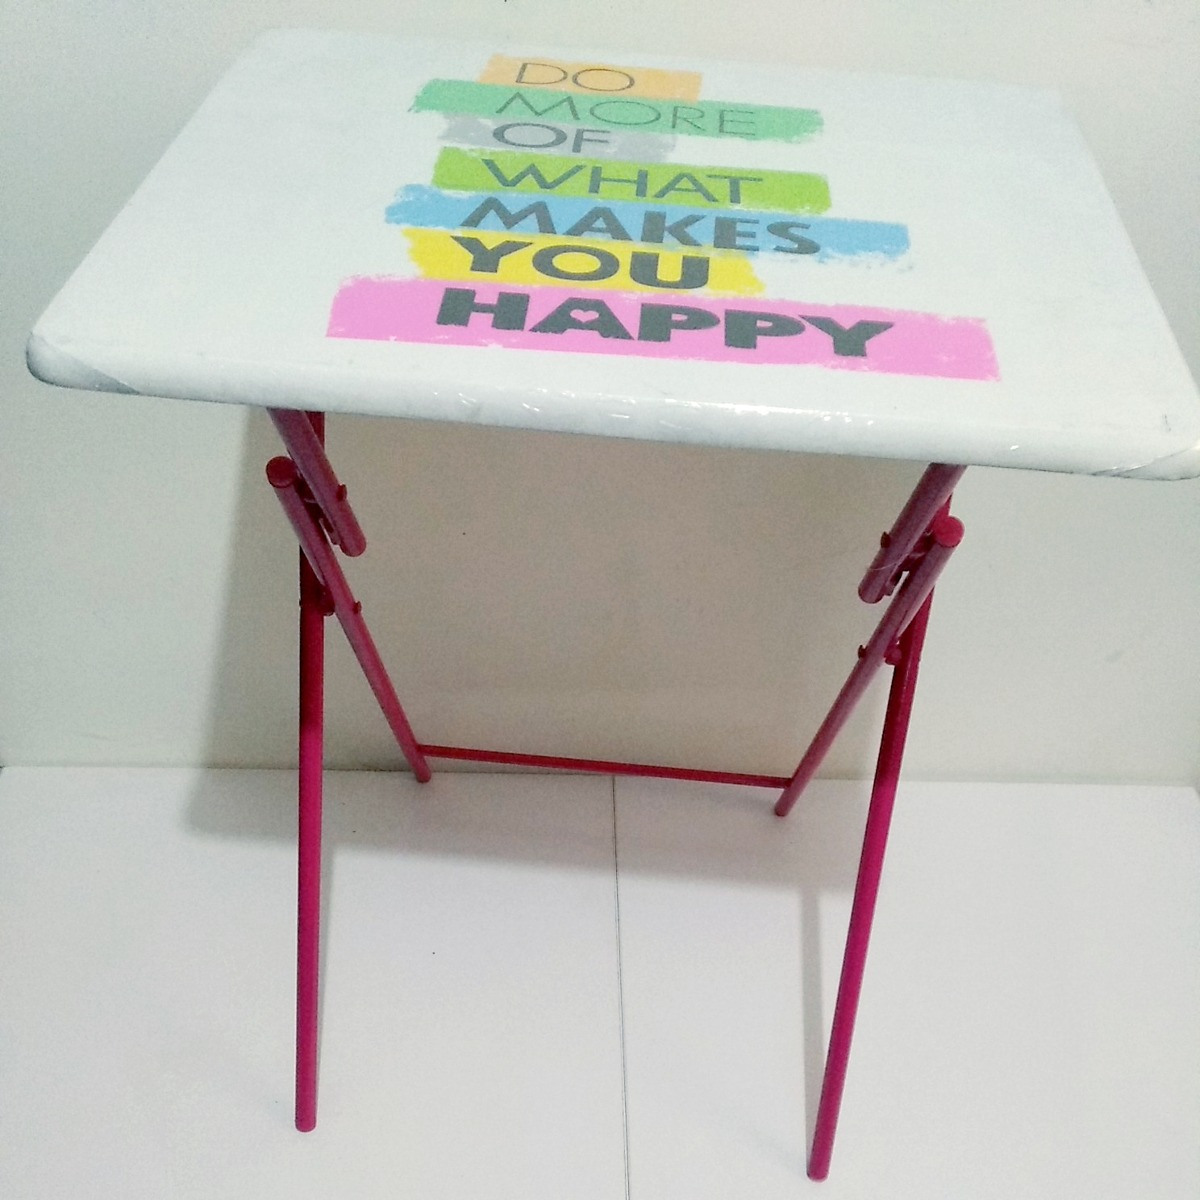 Mesa plegable auxiliar con dise o 48 x 39 envio gratis - Mesa plegable diseno ...